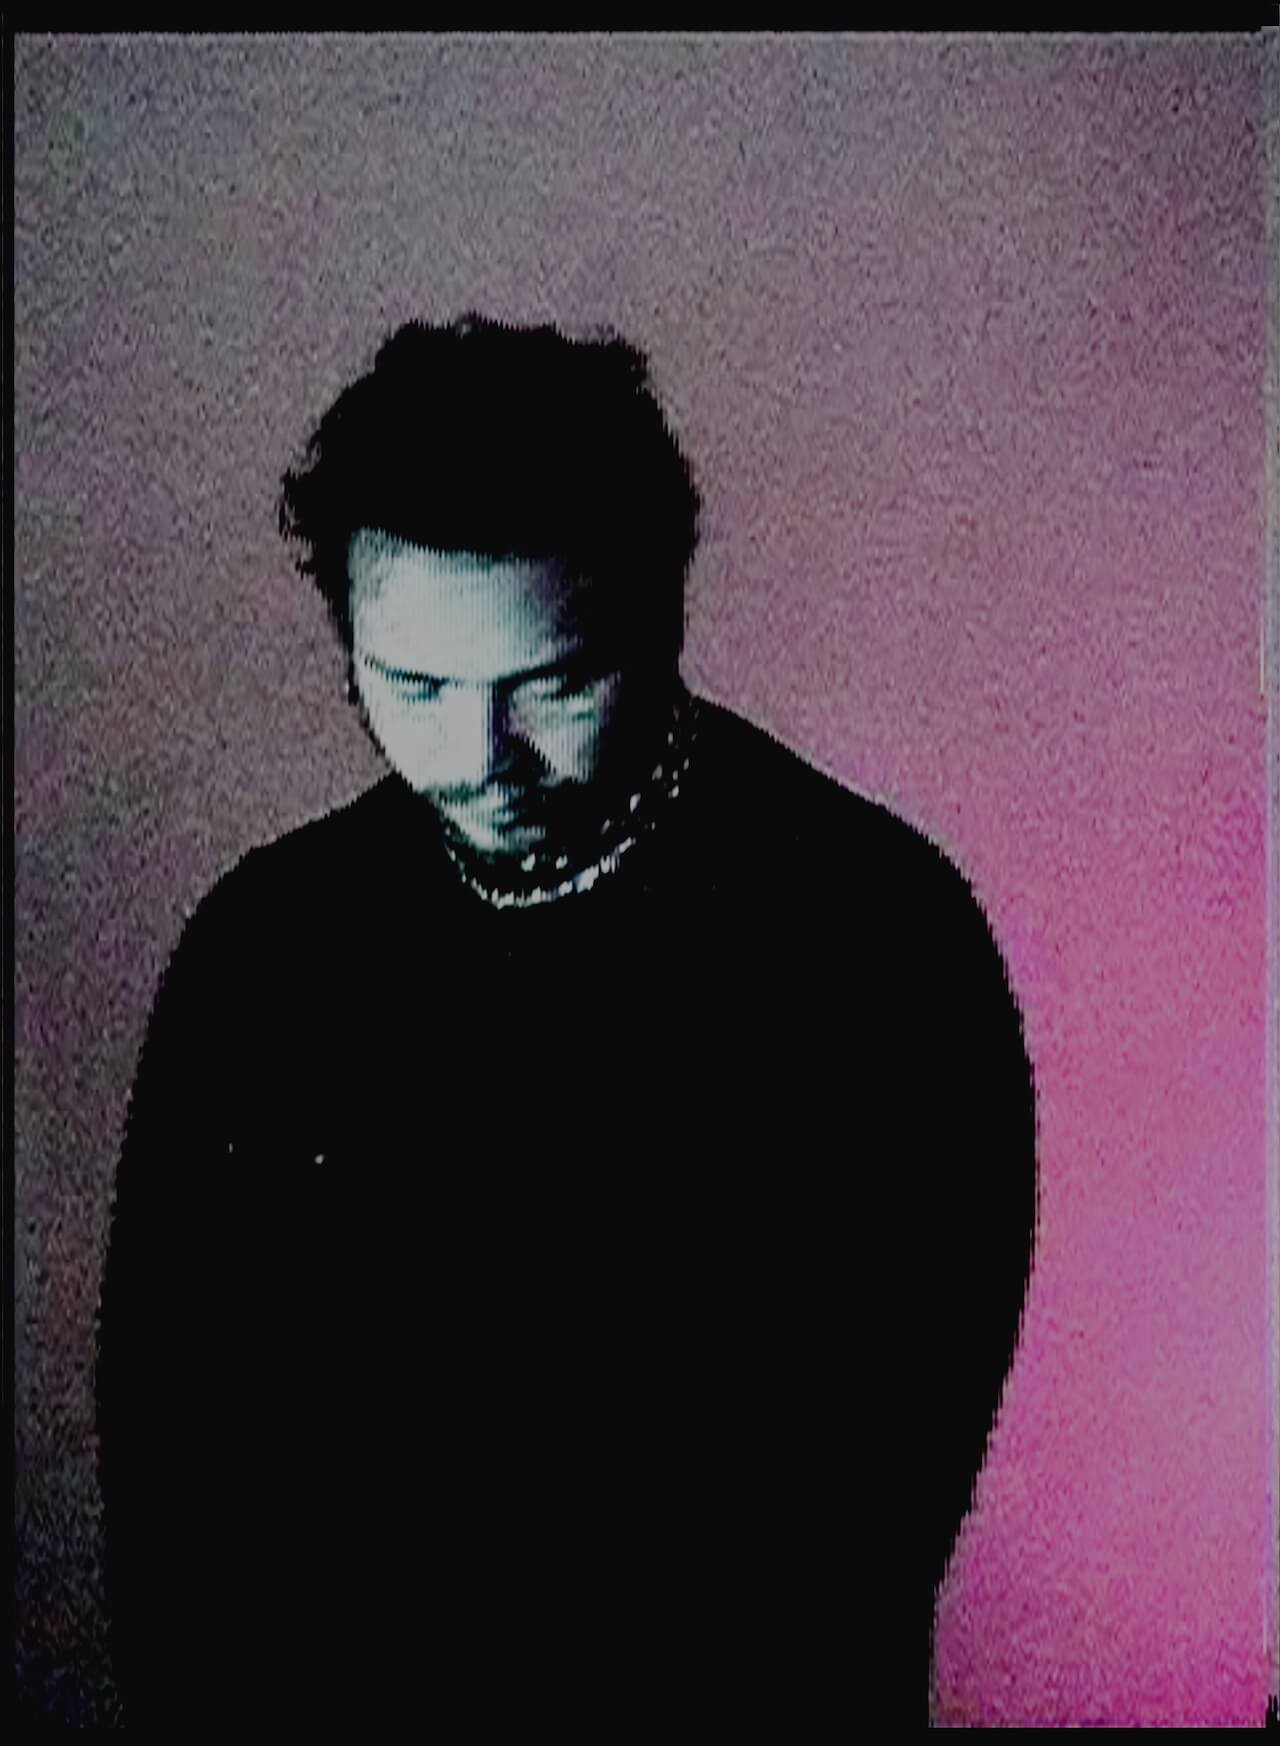 Post Maloneが待望の3rdアルバム『Hollywood's Bleeding』のデジタル配信を本日スタート オジー・オズボーン、SZA、トラヴィス・スコットらが参加 music190906-postmalone-2